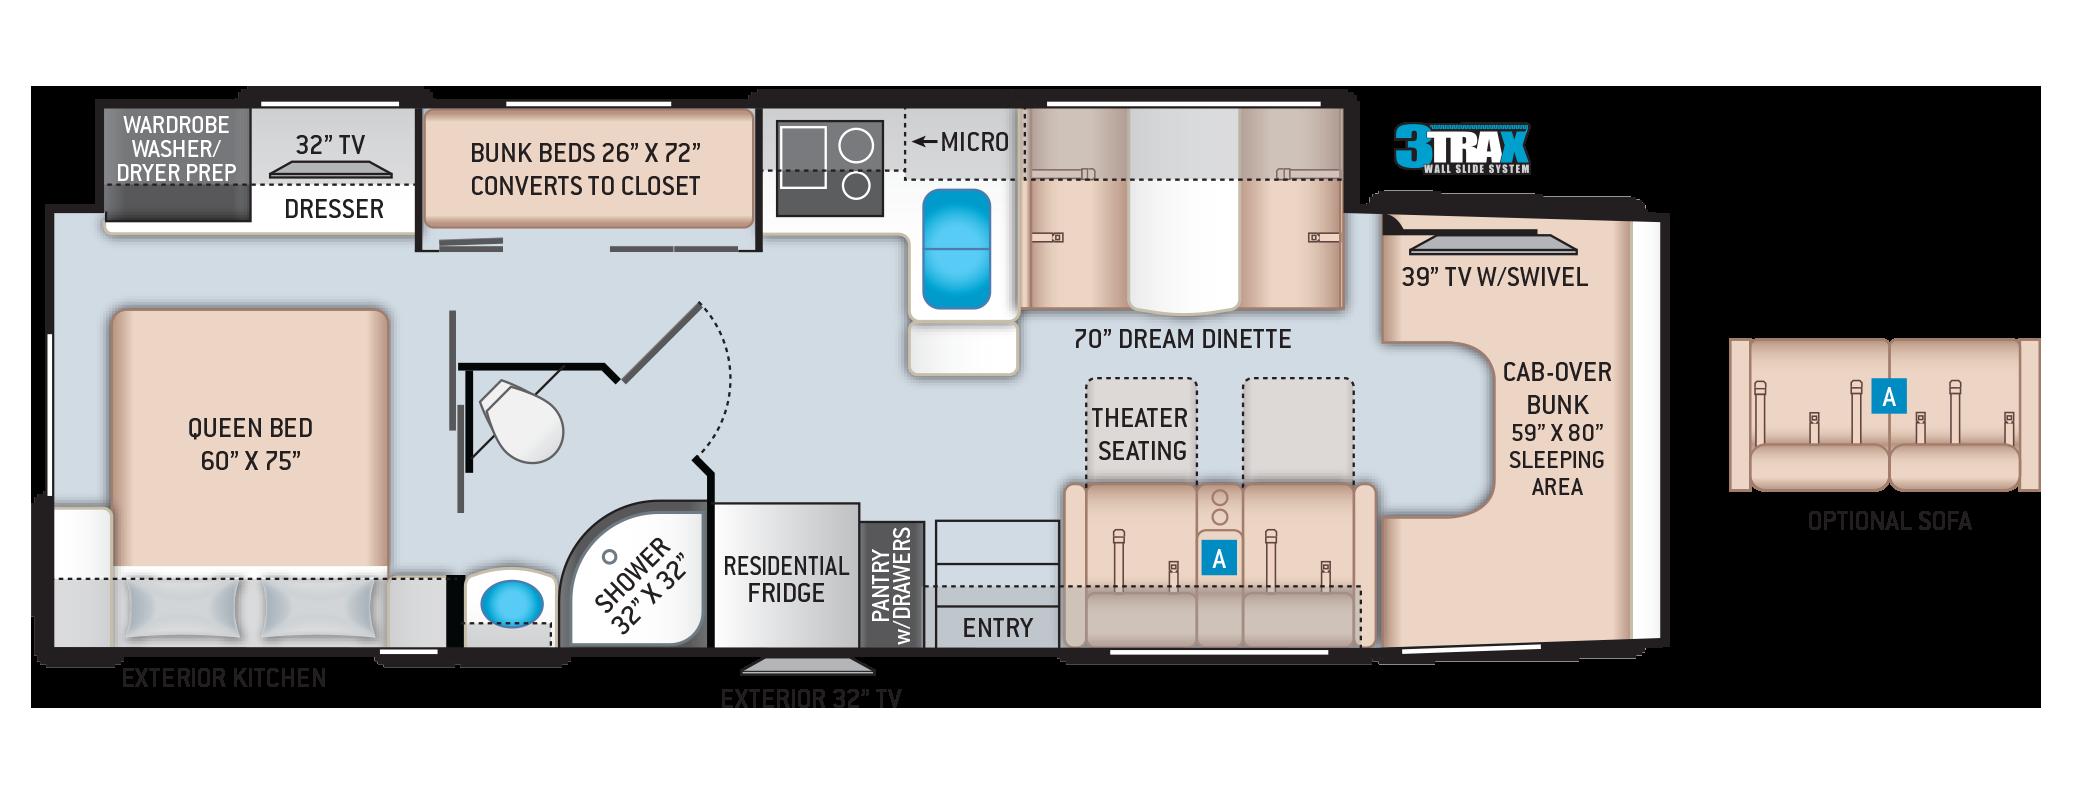 Magnitude Super C RV RB34 Floor Plan